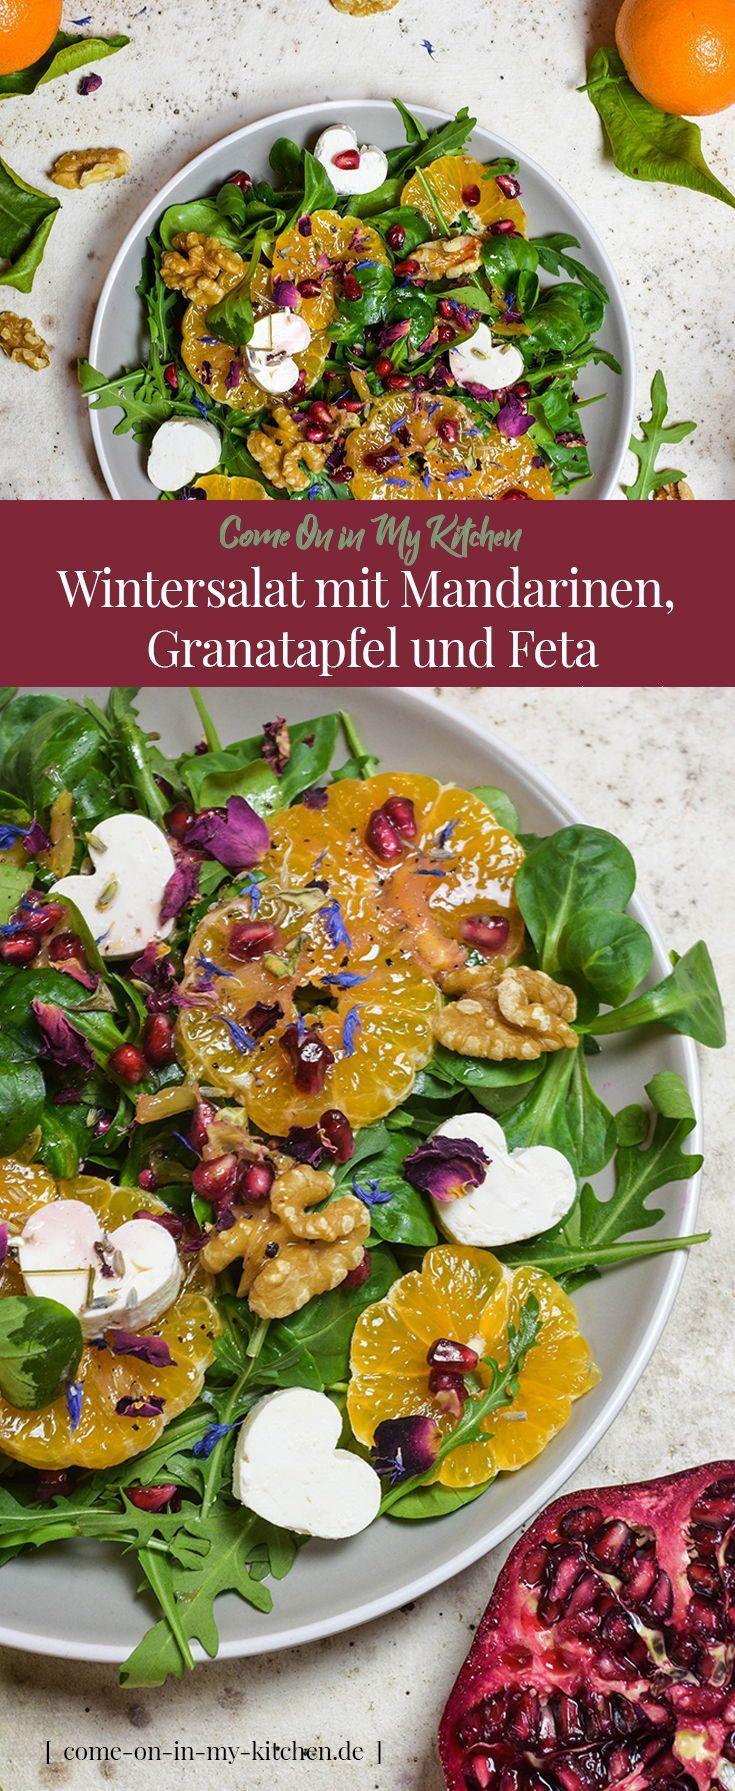 Wintersalat mit Mandarinen, Granatapfel und Feta